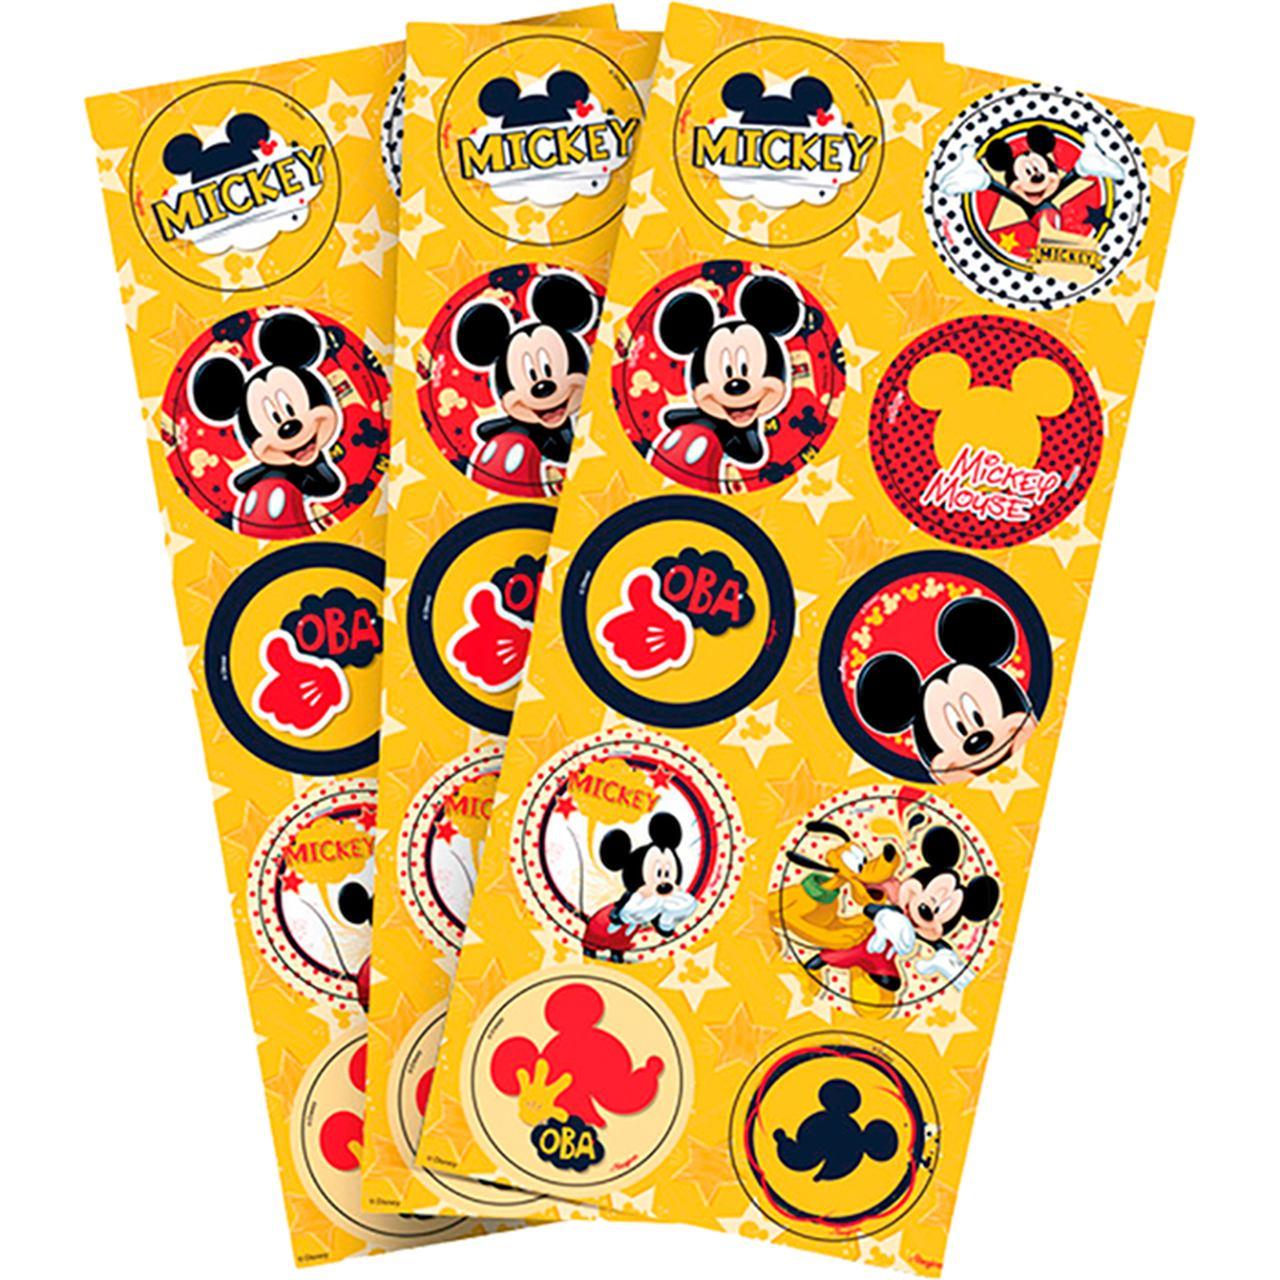 Adesivo Decorativo Redondo Mickey Mouse/ 03 Cartelas